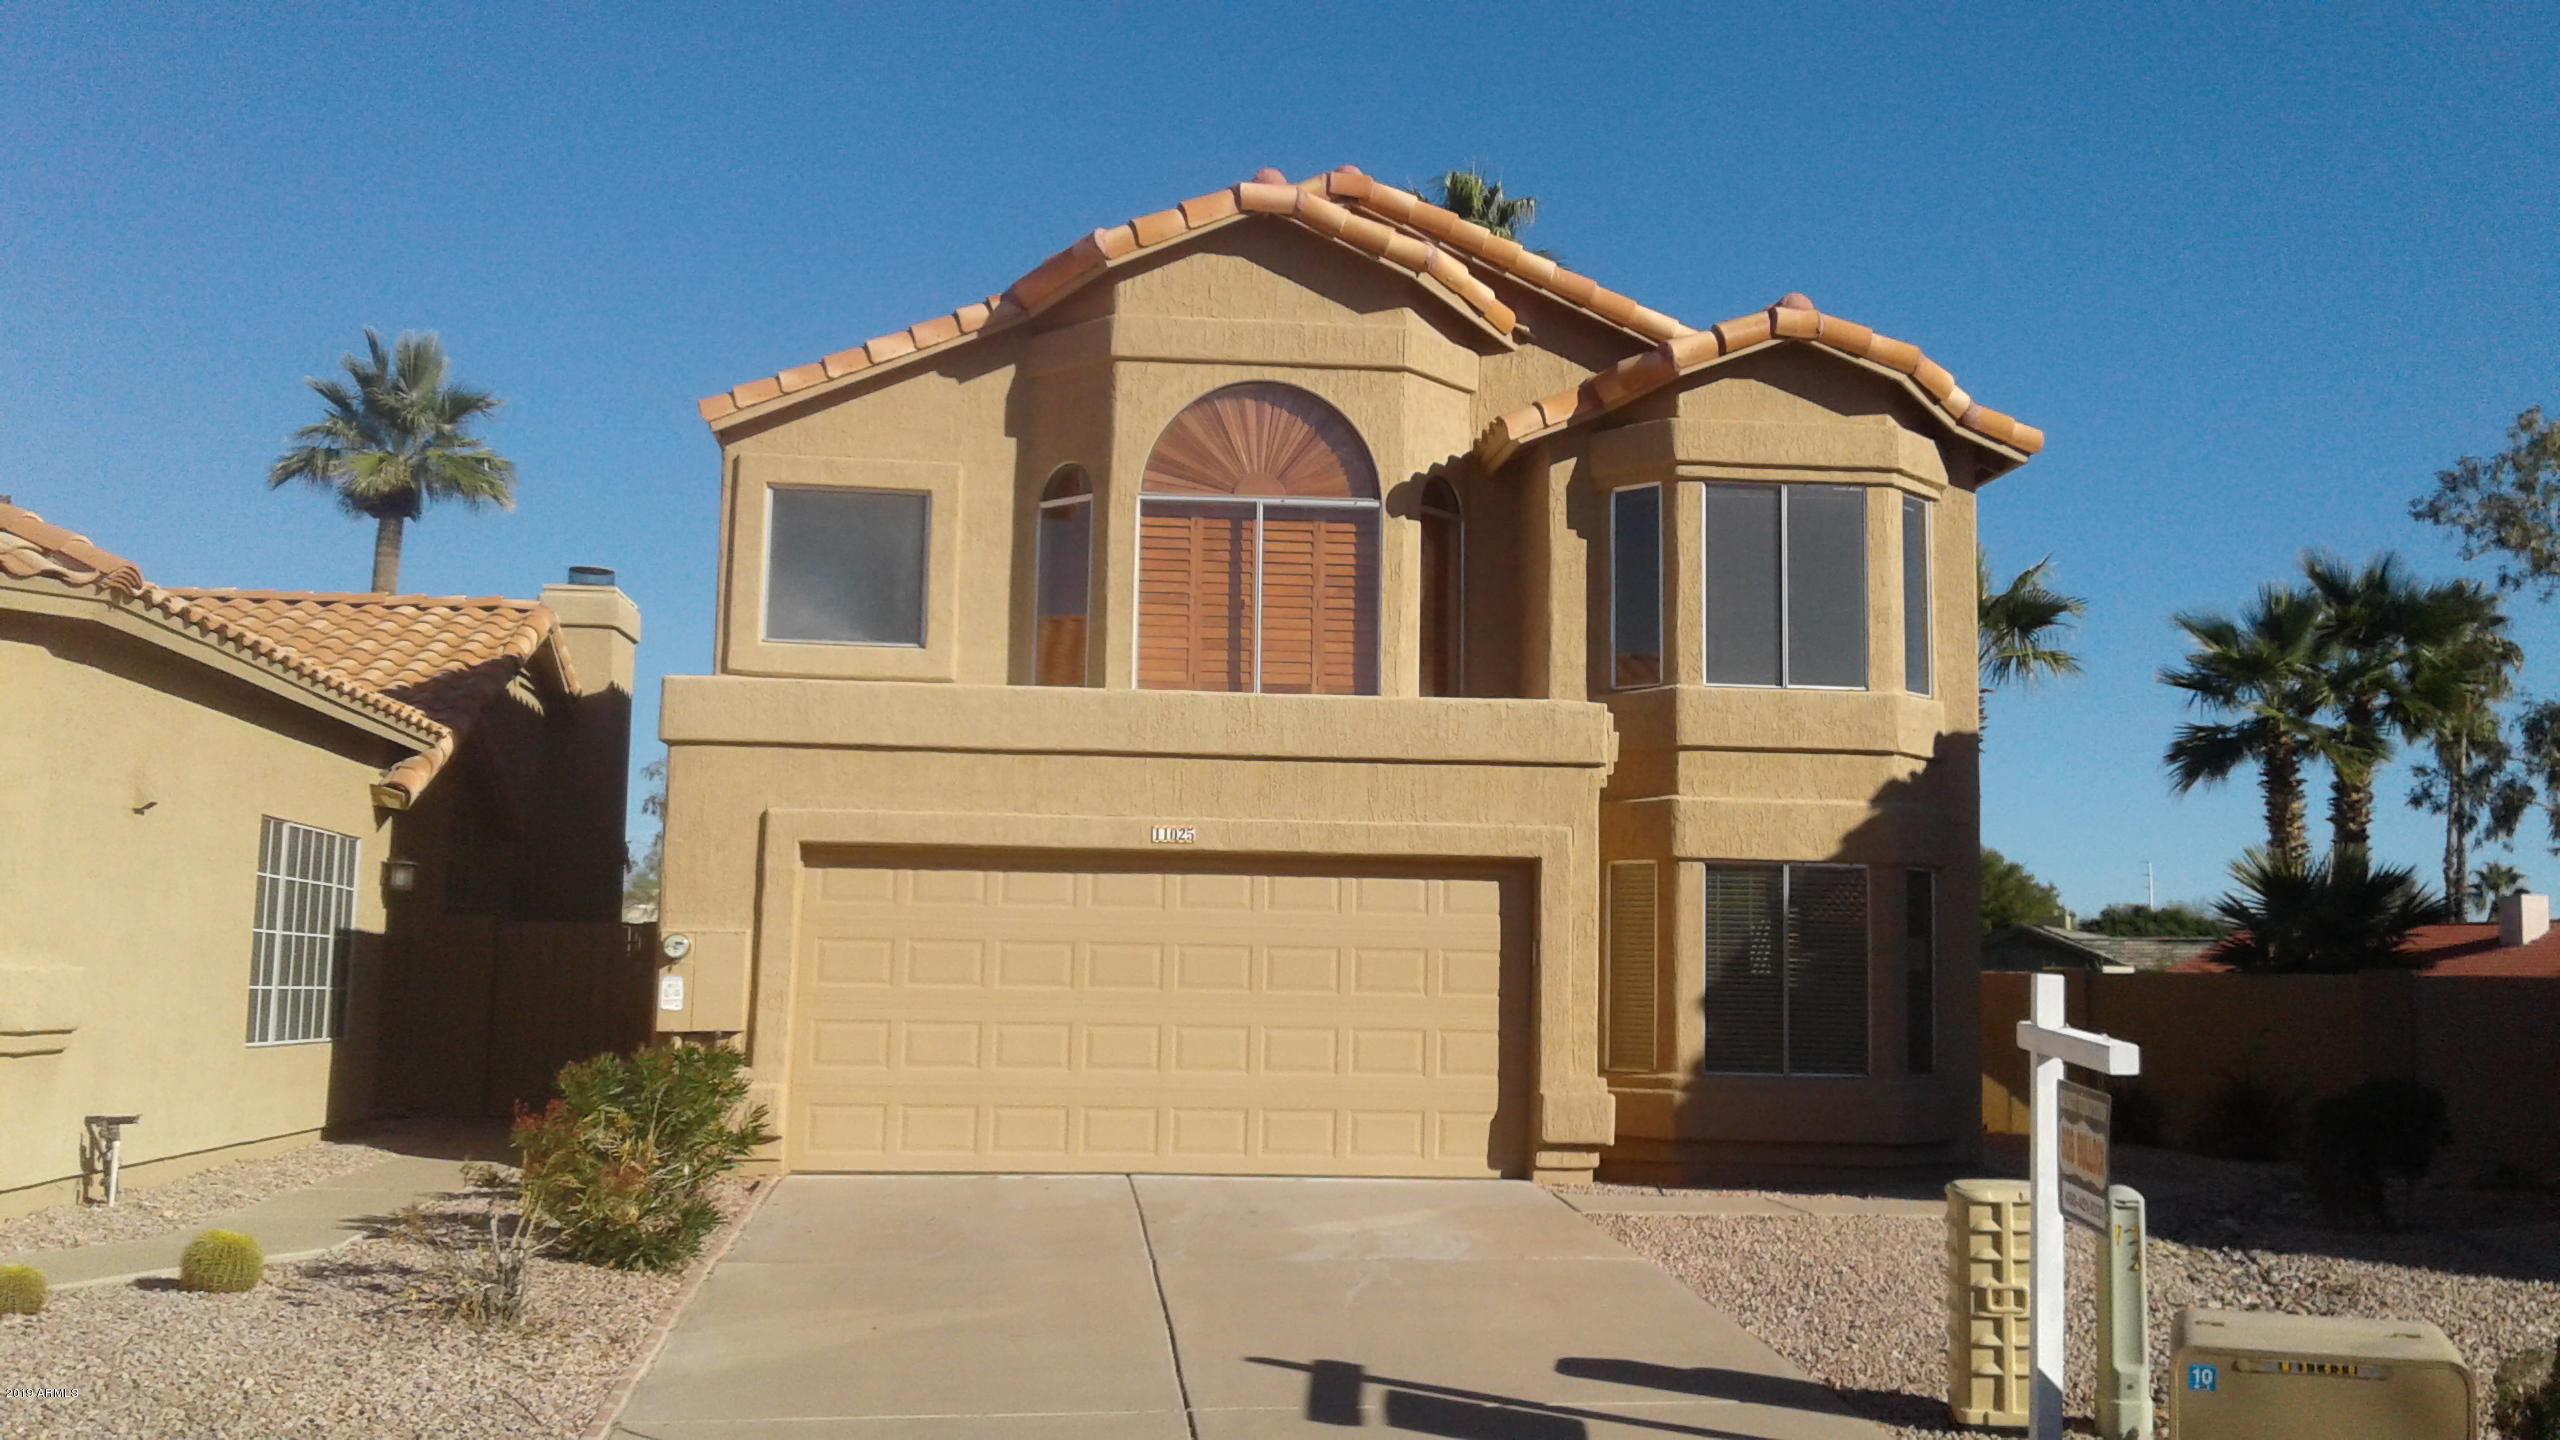 Photo of 11025 N 111TH Way, Scottsdale, AZ 85259